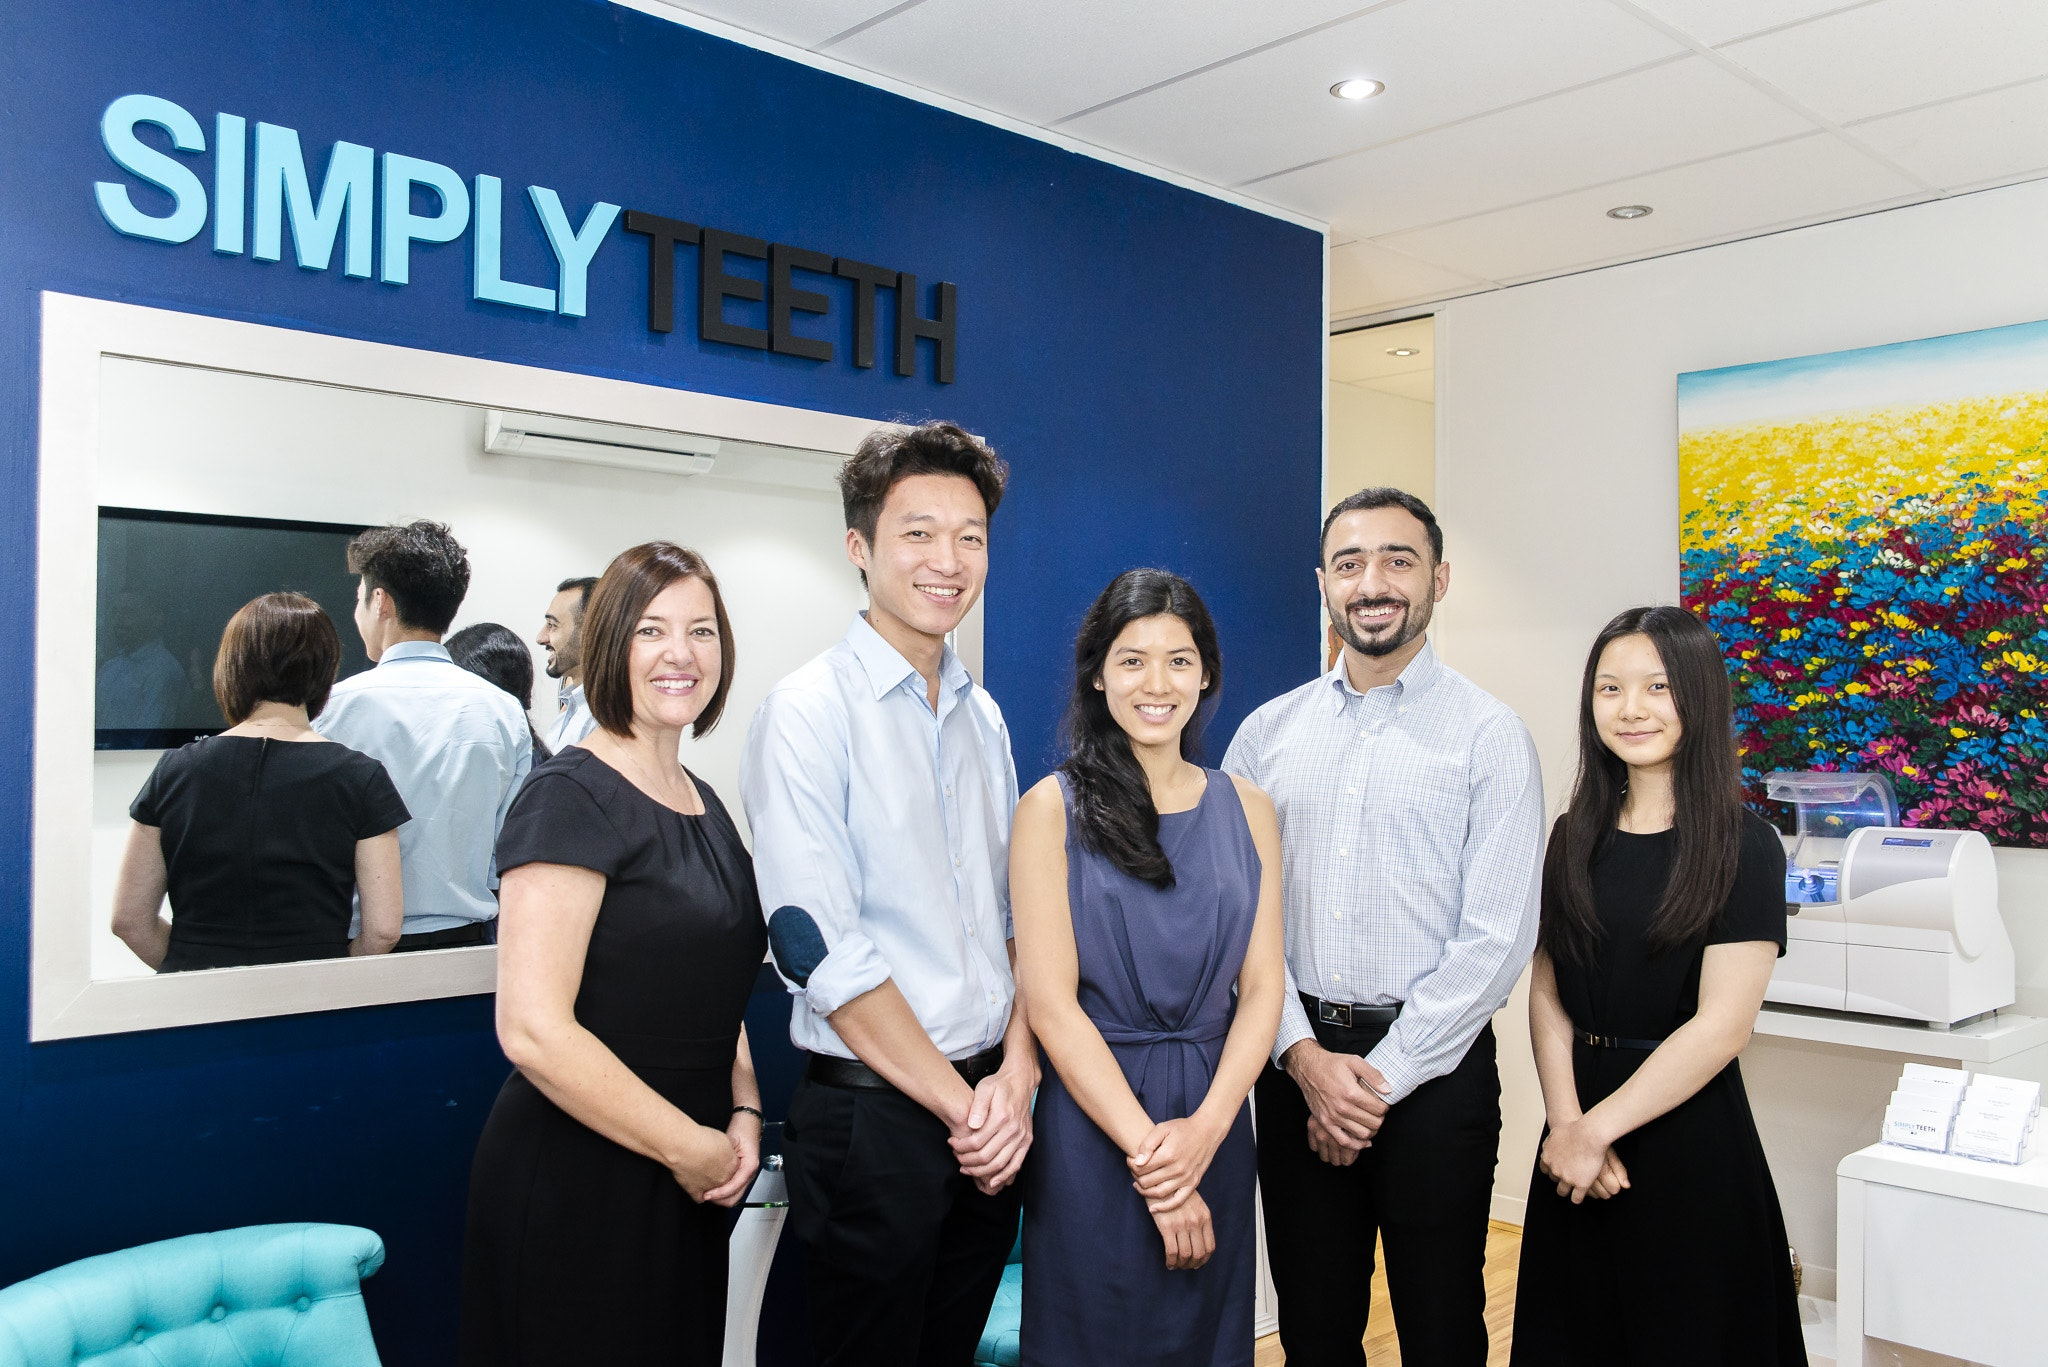 Staff at Simply Teeth